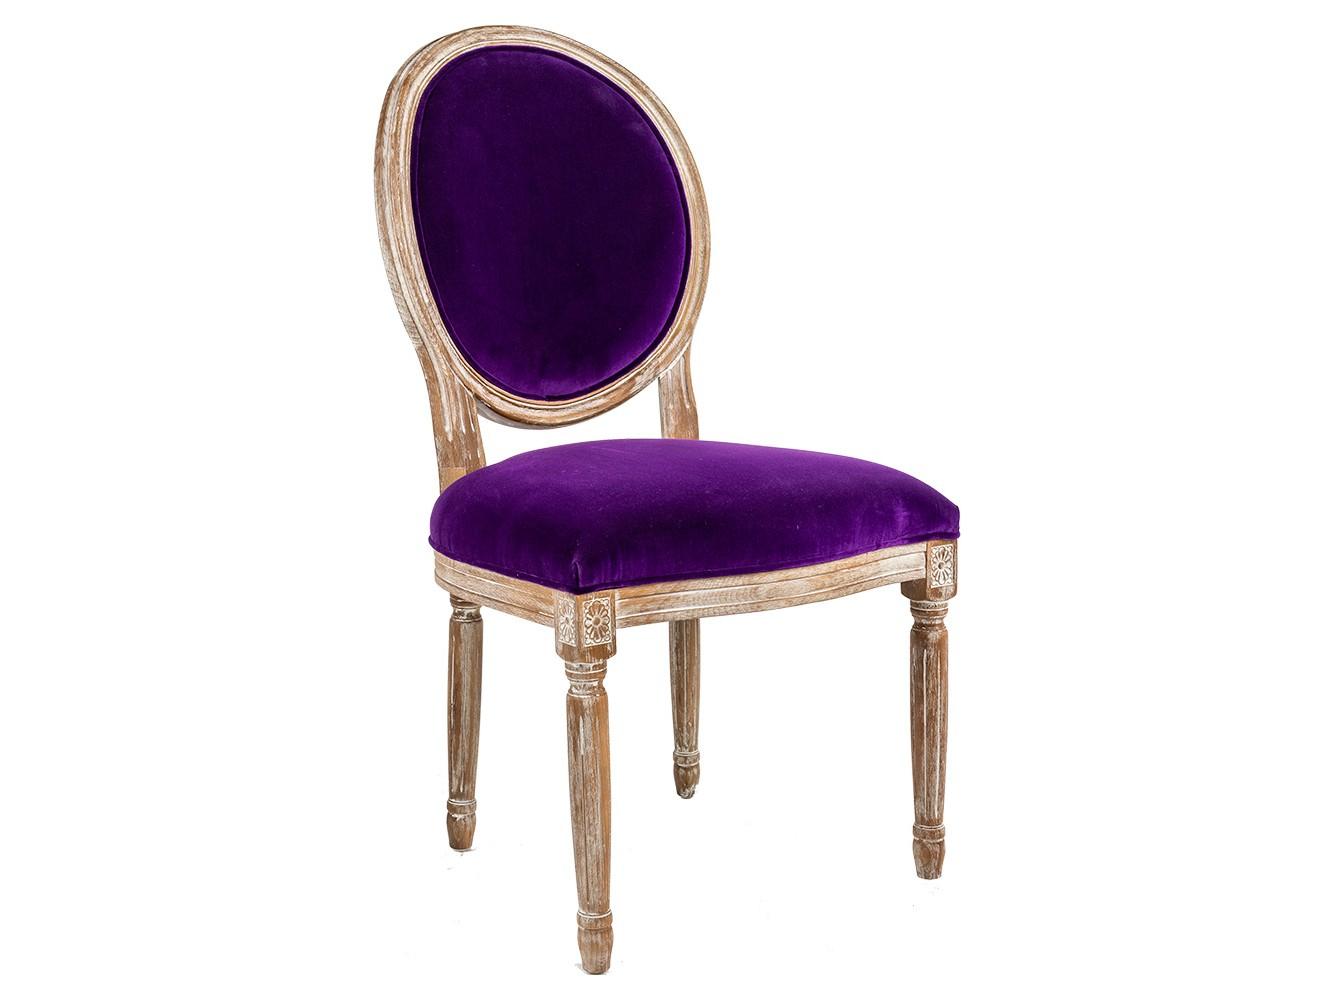 Кухонный стул Object Desire 15438256 от thefurnish